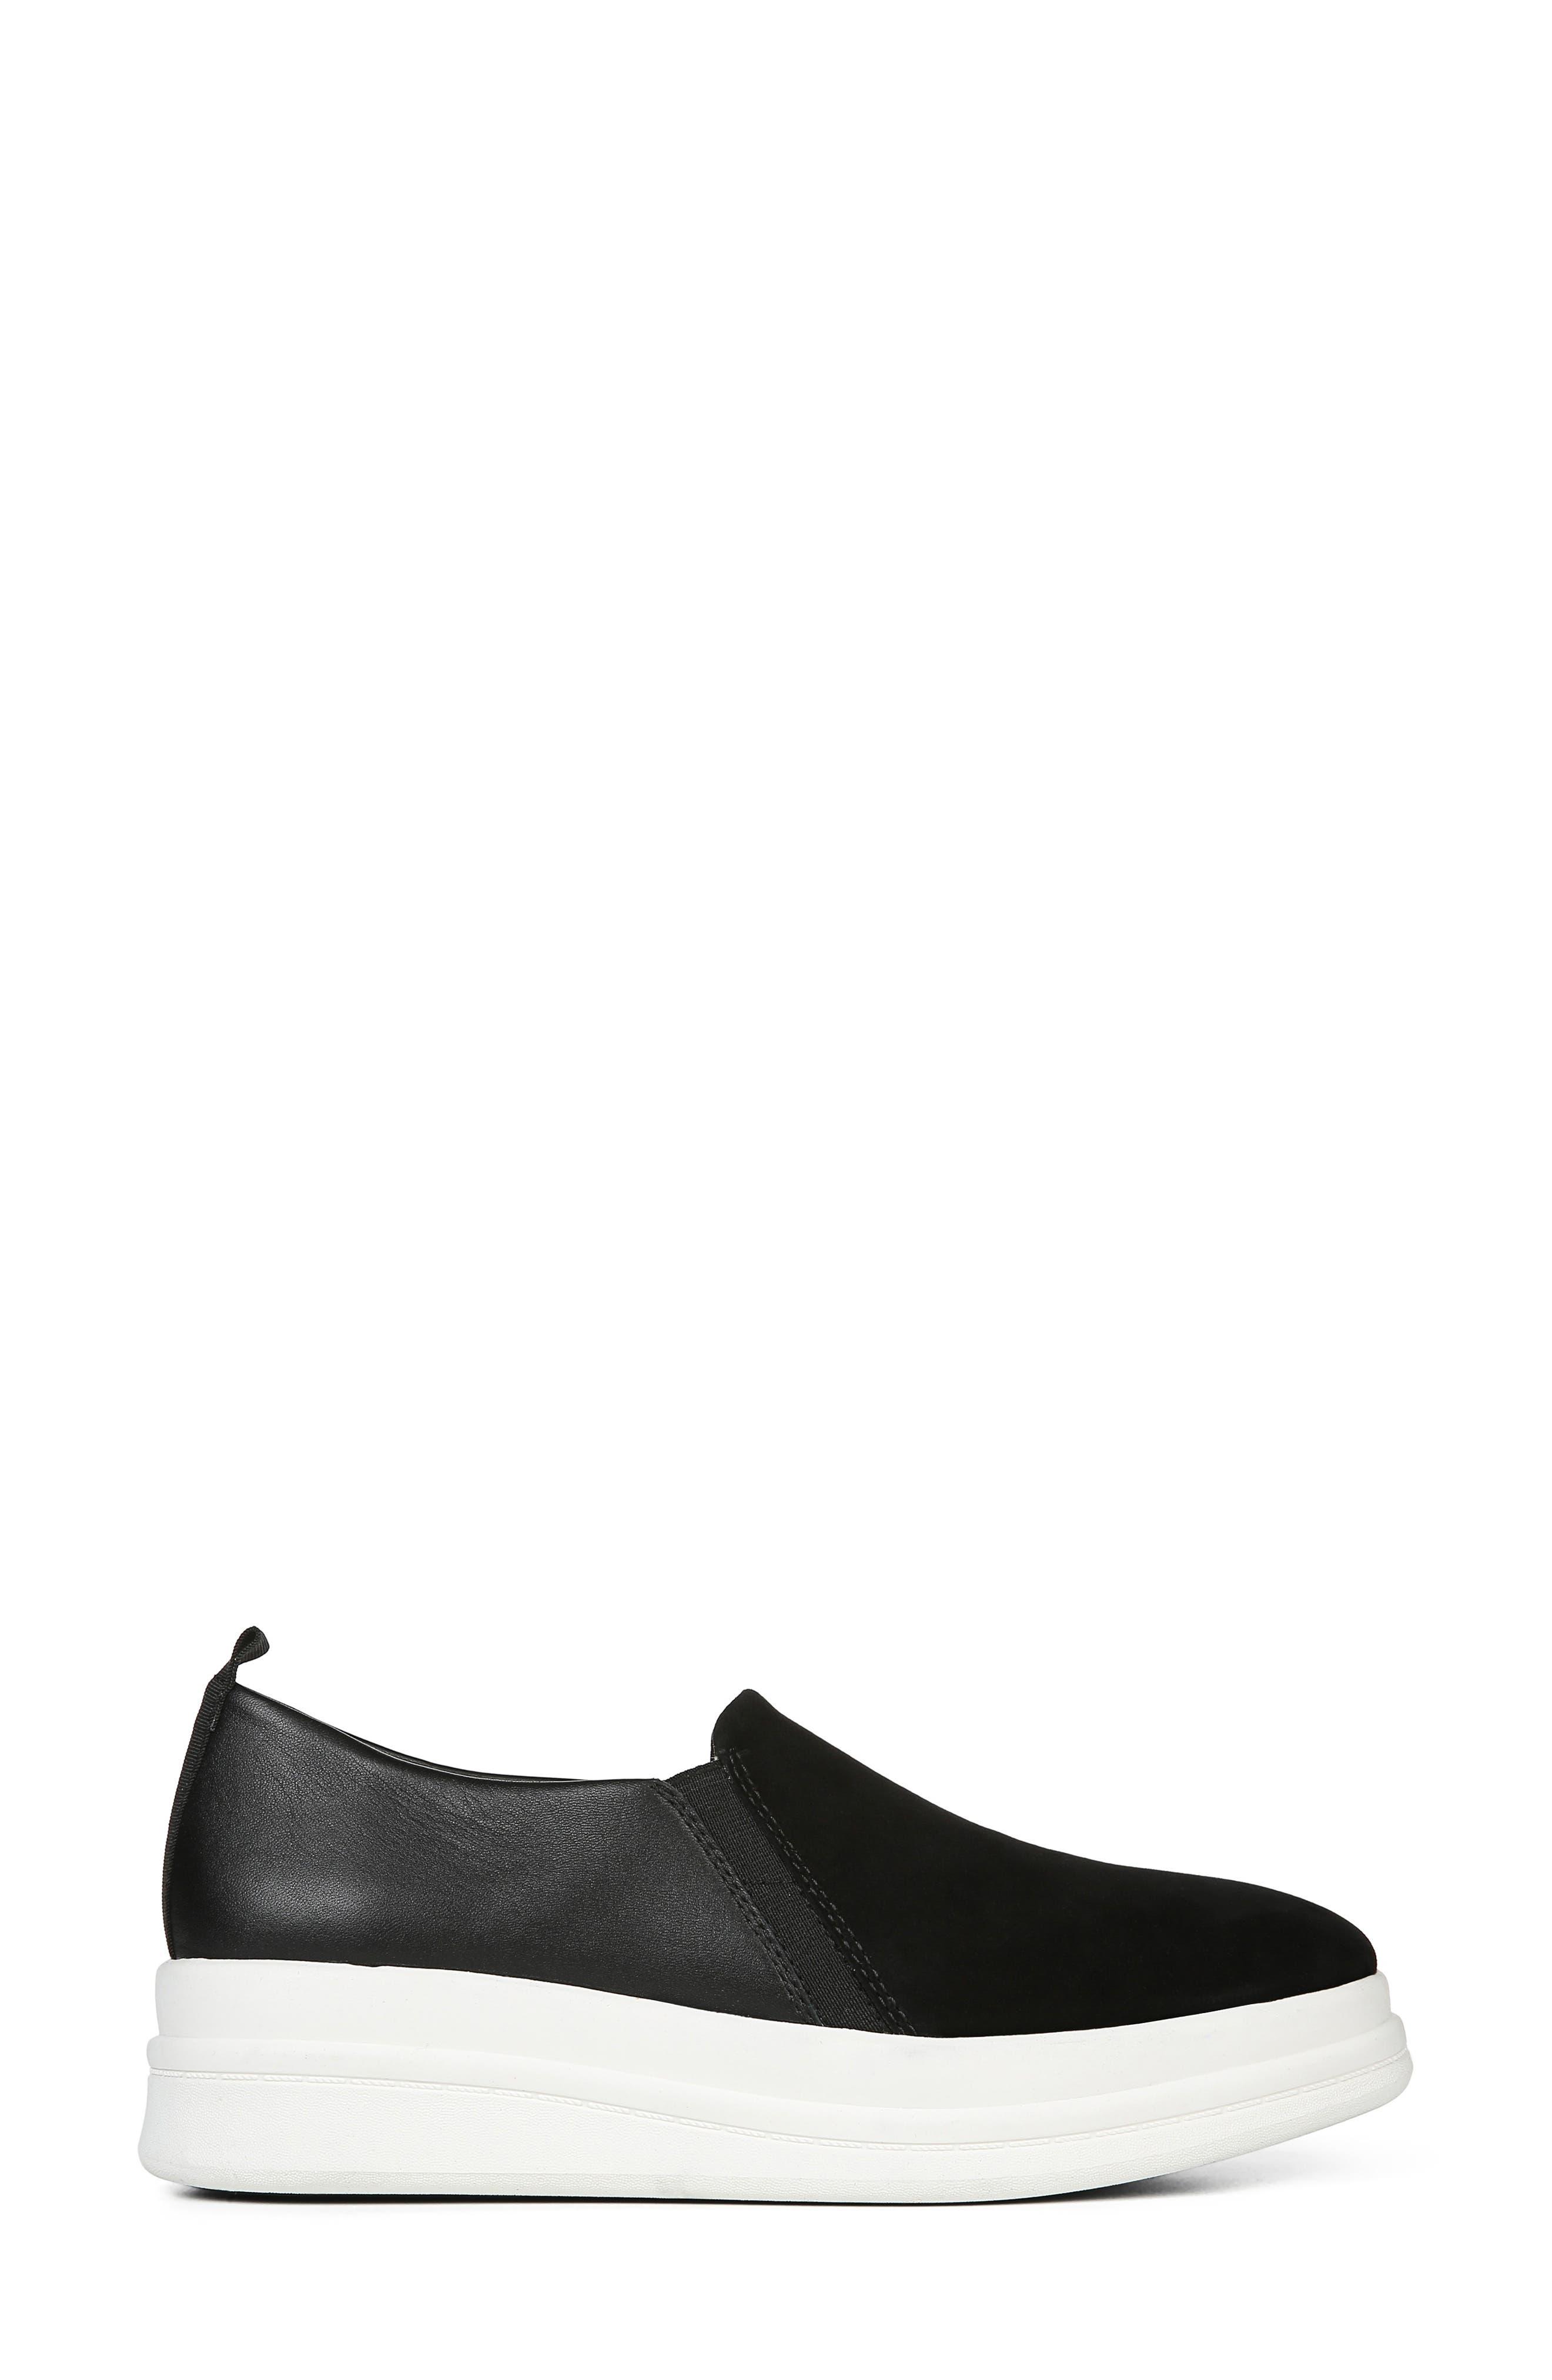 ,                             Yola Slip-On Sneaker,                             Alternate thumbnail 3, color,                             BLACK SUEDE/ LEATHER